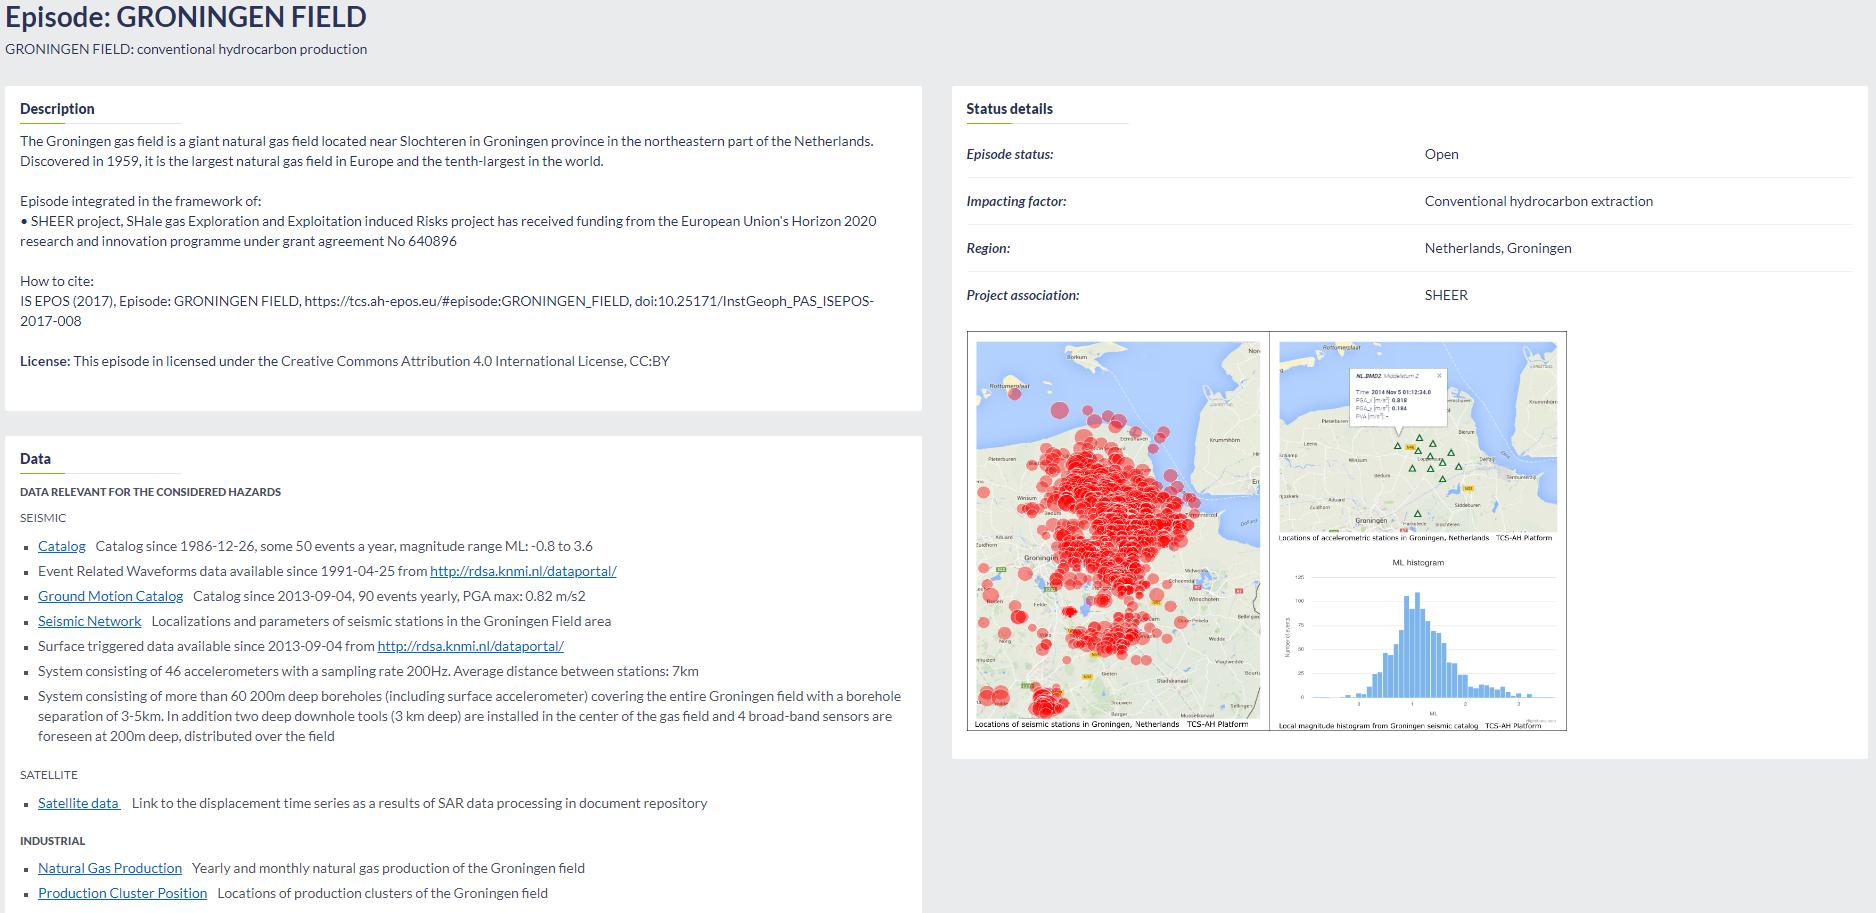 Groningen Episode - data provided by KNMI